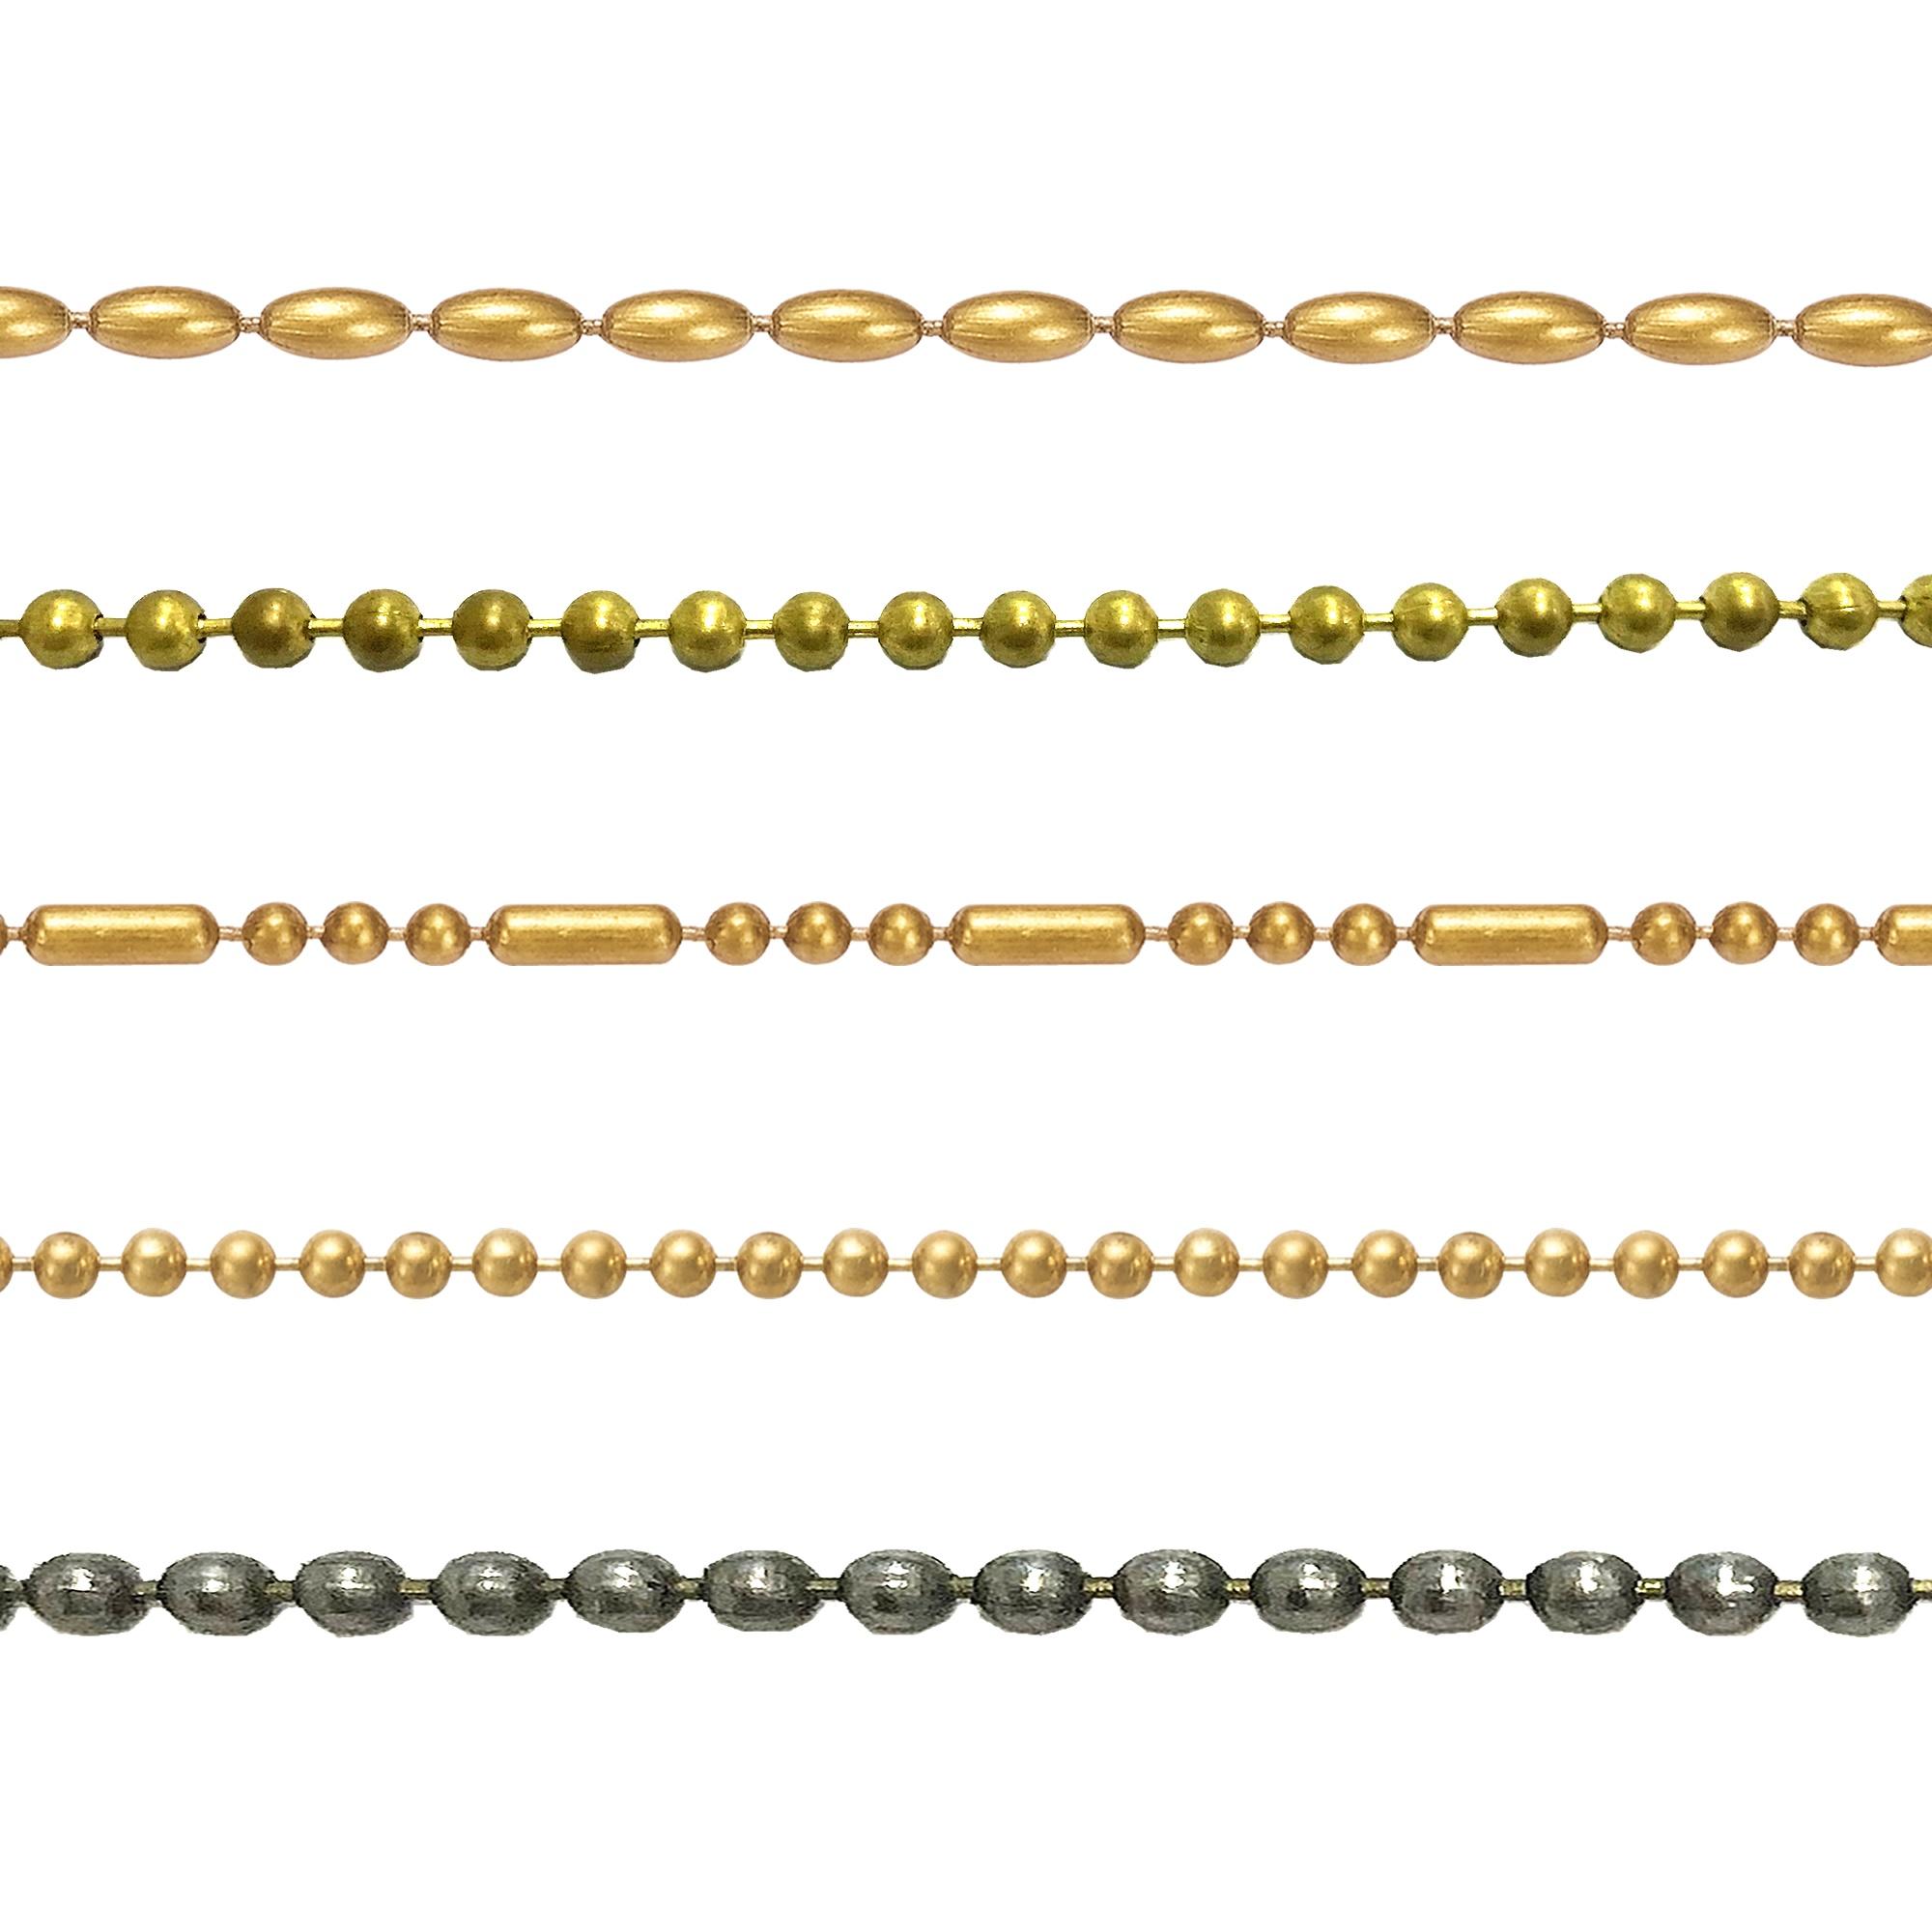 LX338 雙頭片沖小珠鏈機樣品.JPG